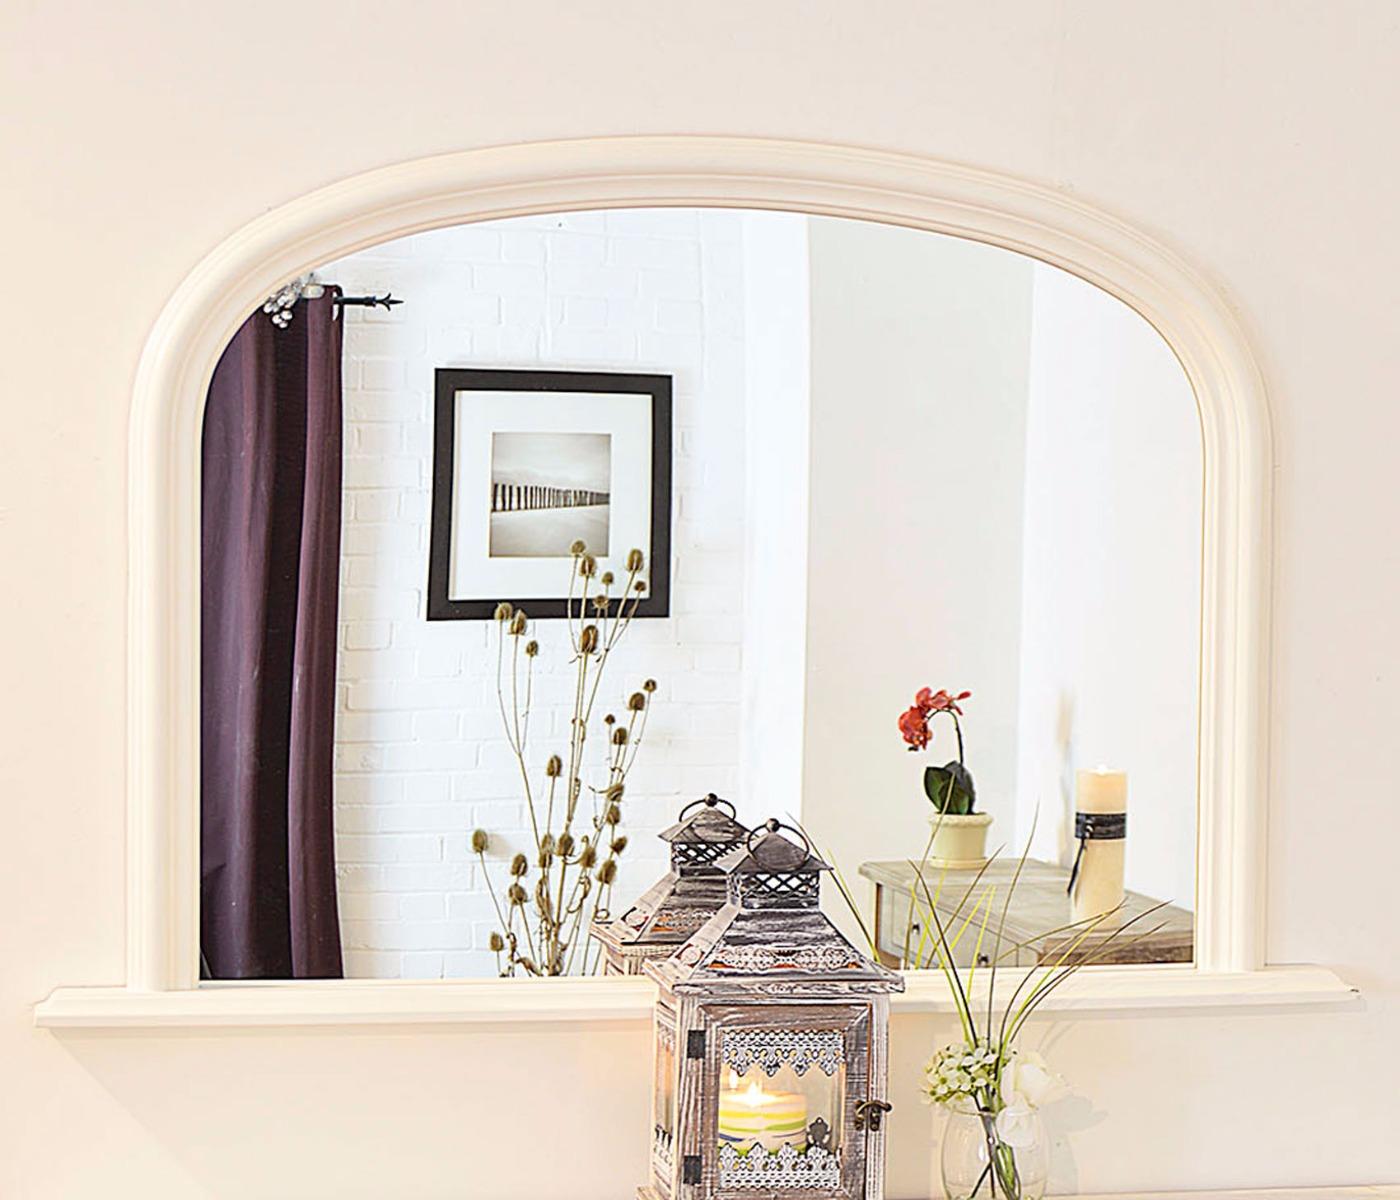 large white over mantle big overmantle wall mirror new 4ft x 2ft7 120cm x 79cm 5060301519972 ebay. Black Bedroom Furniture Sets. Home Design Ideas